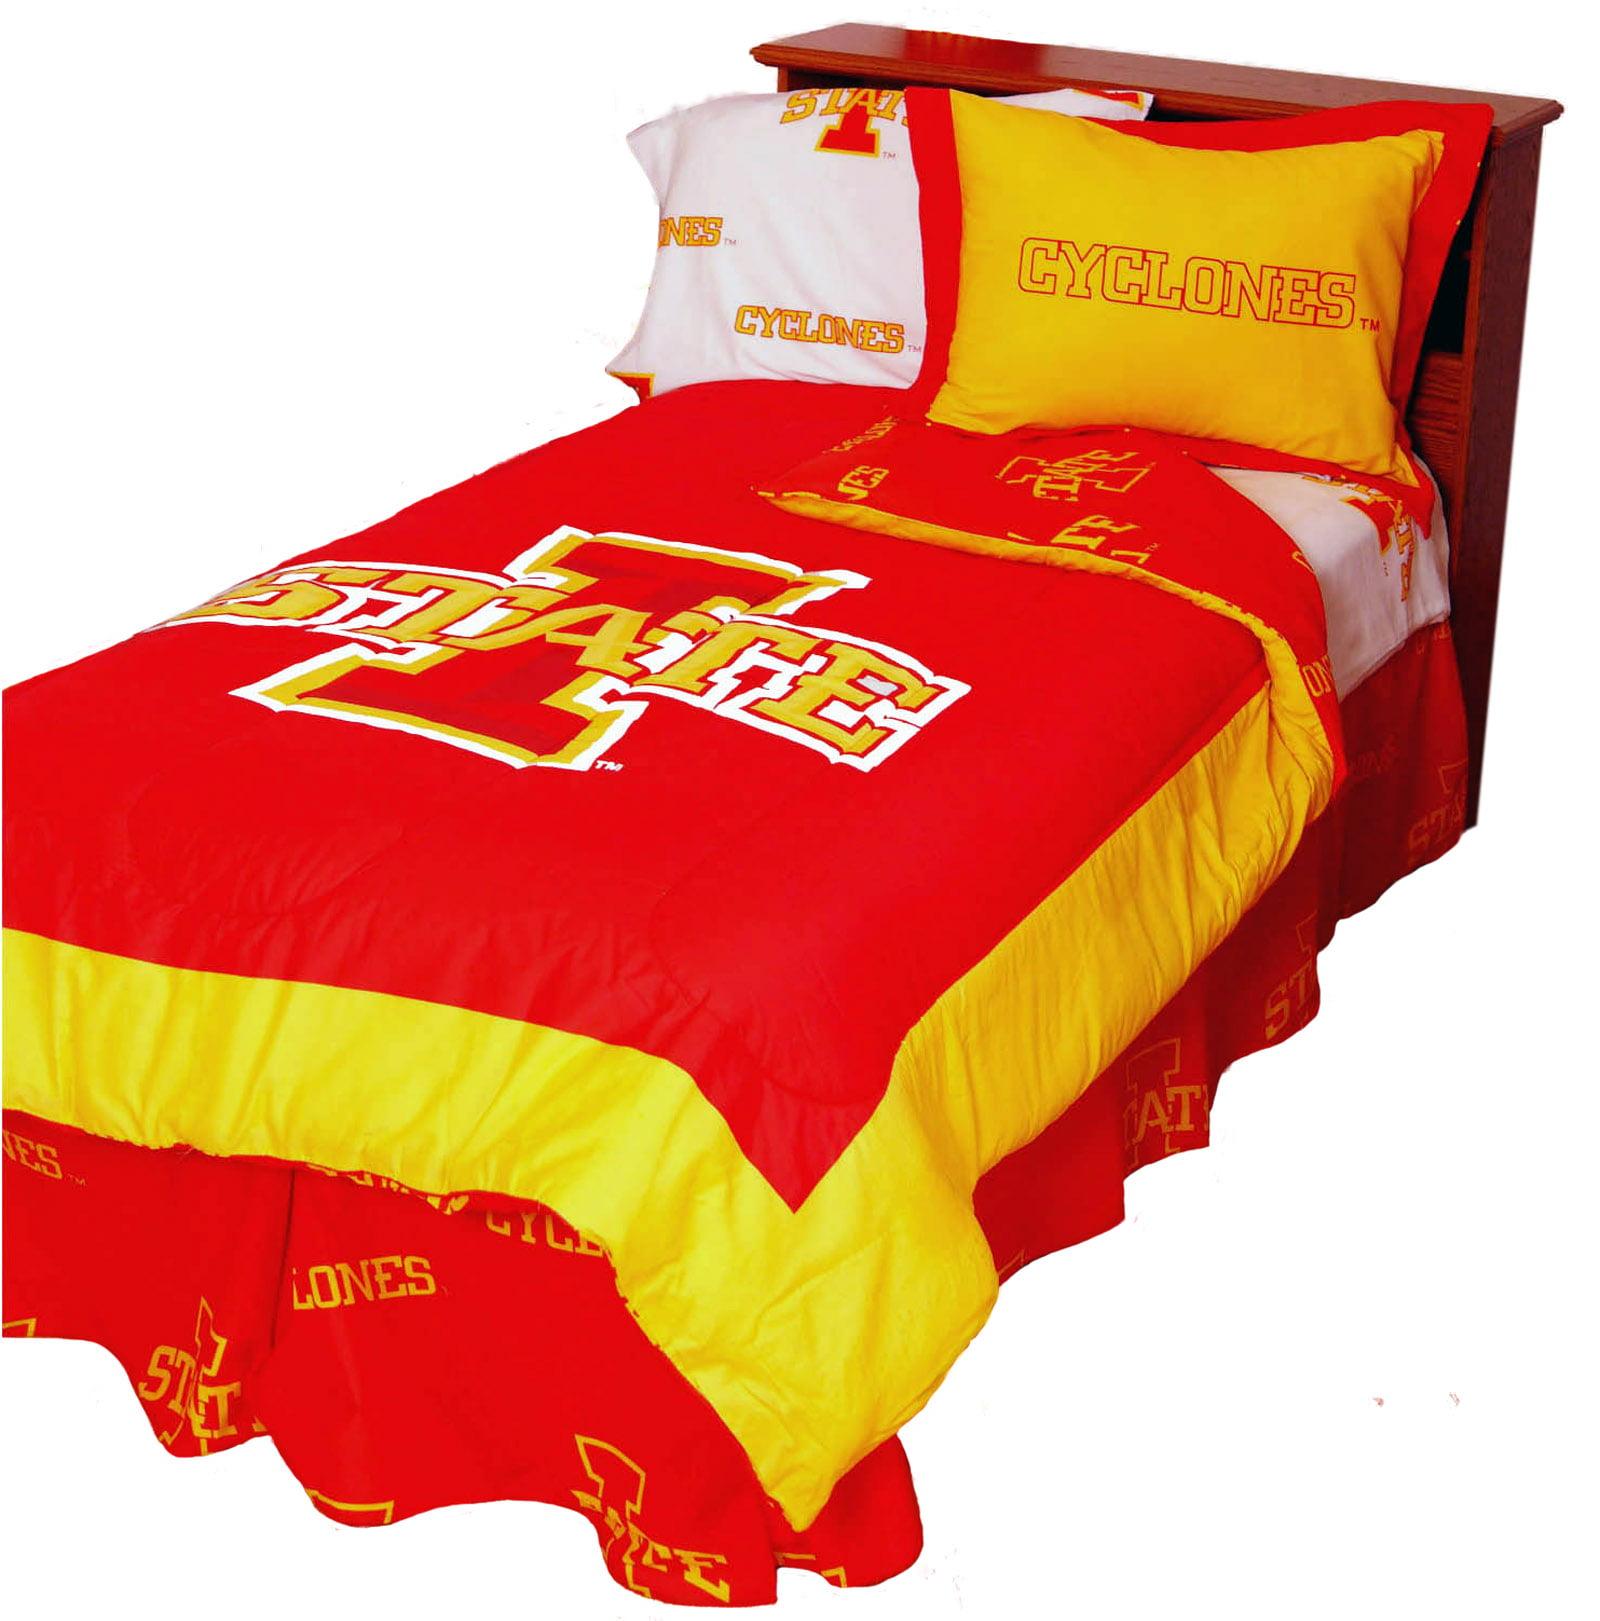 Iowa State Cyclones 2 Pc Comforter Set, 1 Comforter, 1 Sham, Twin